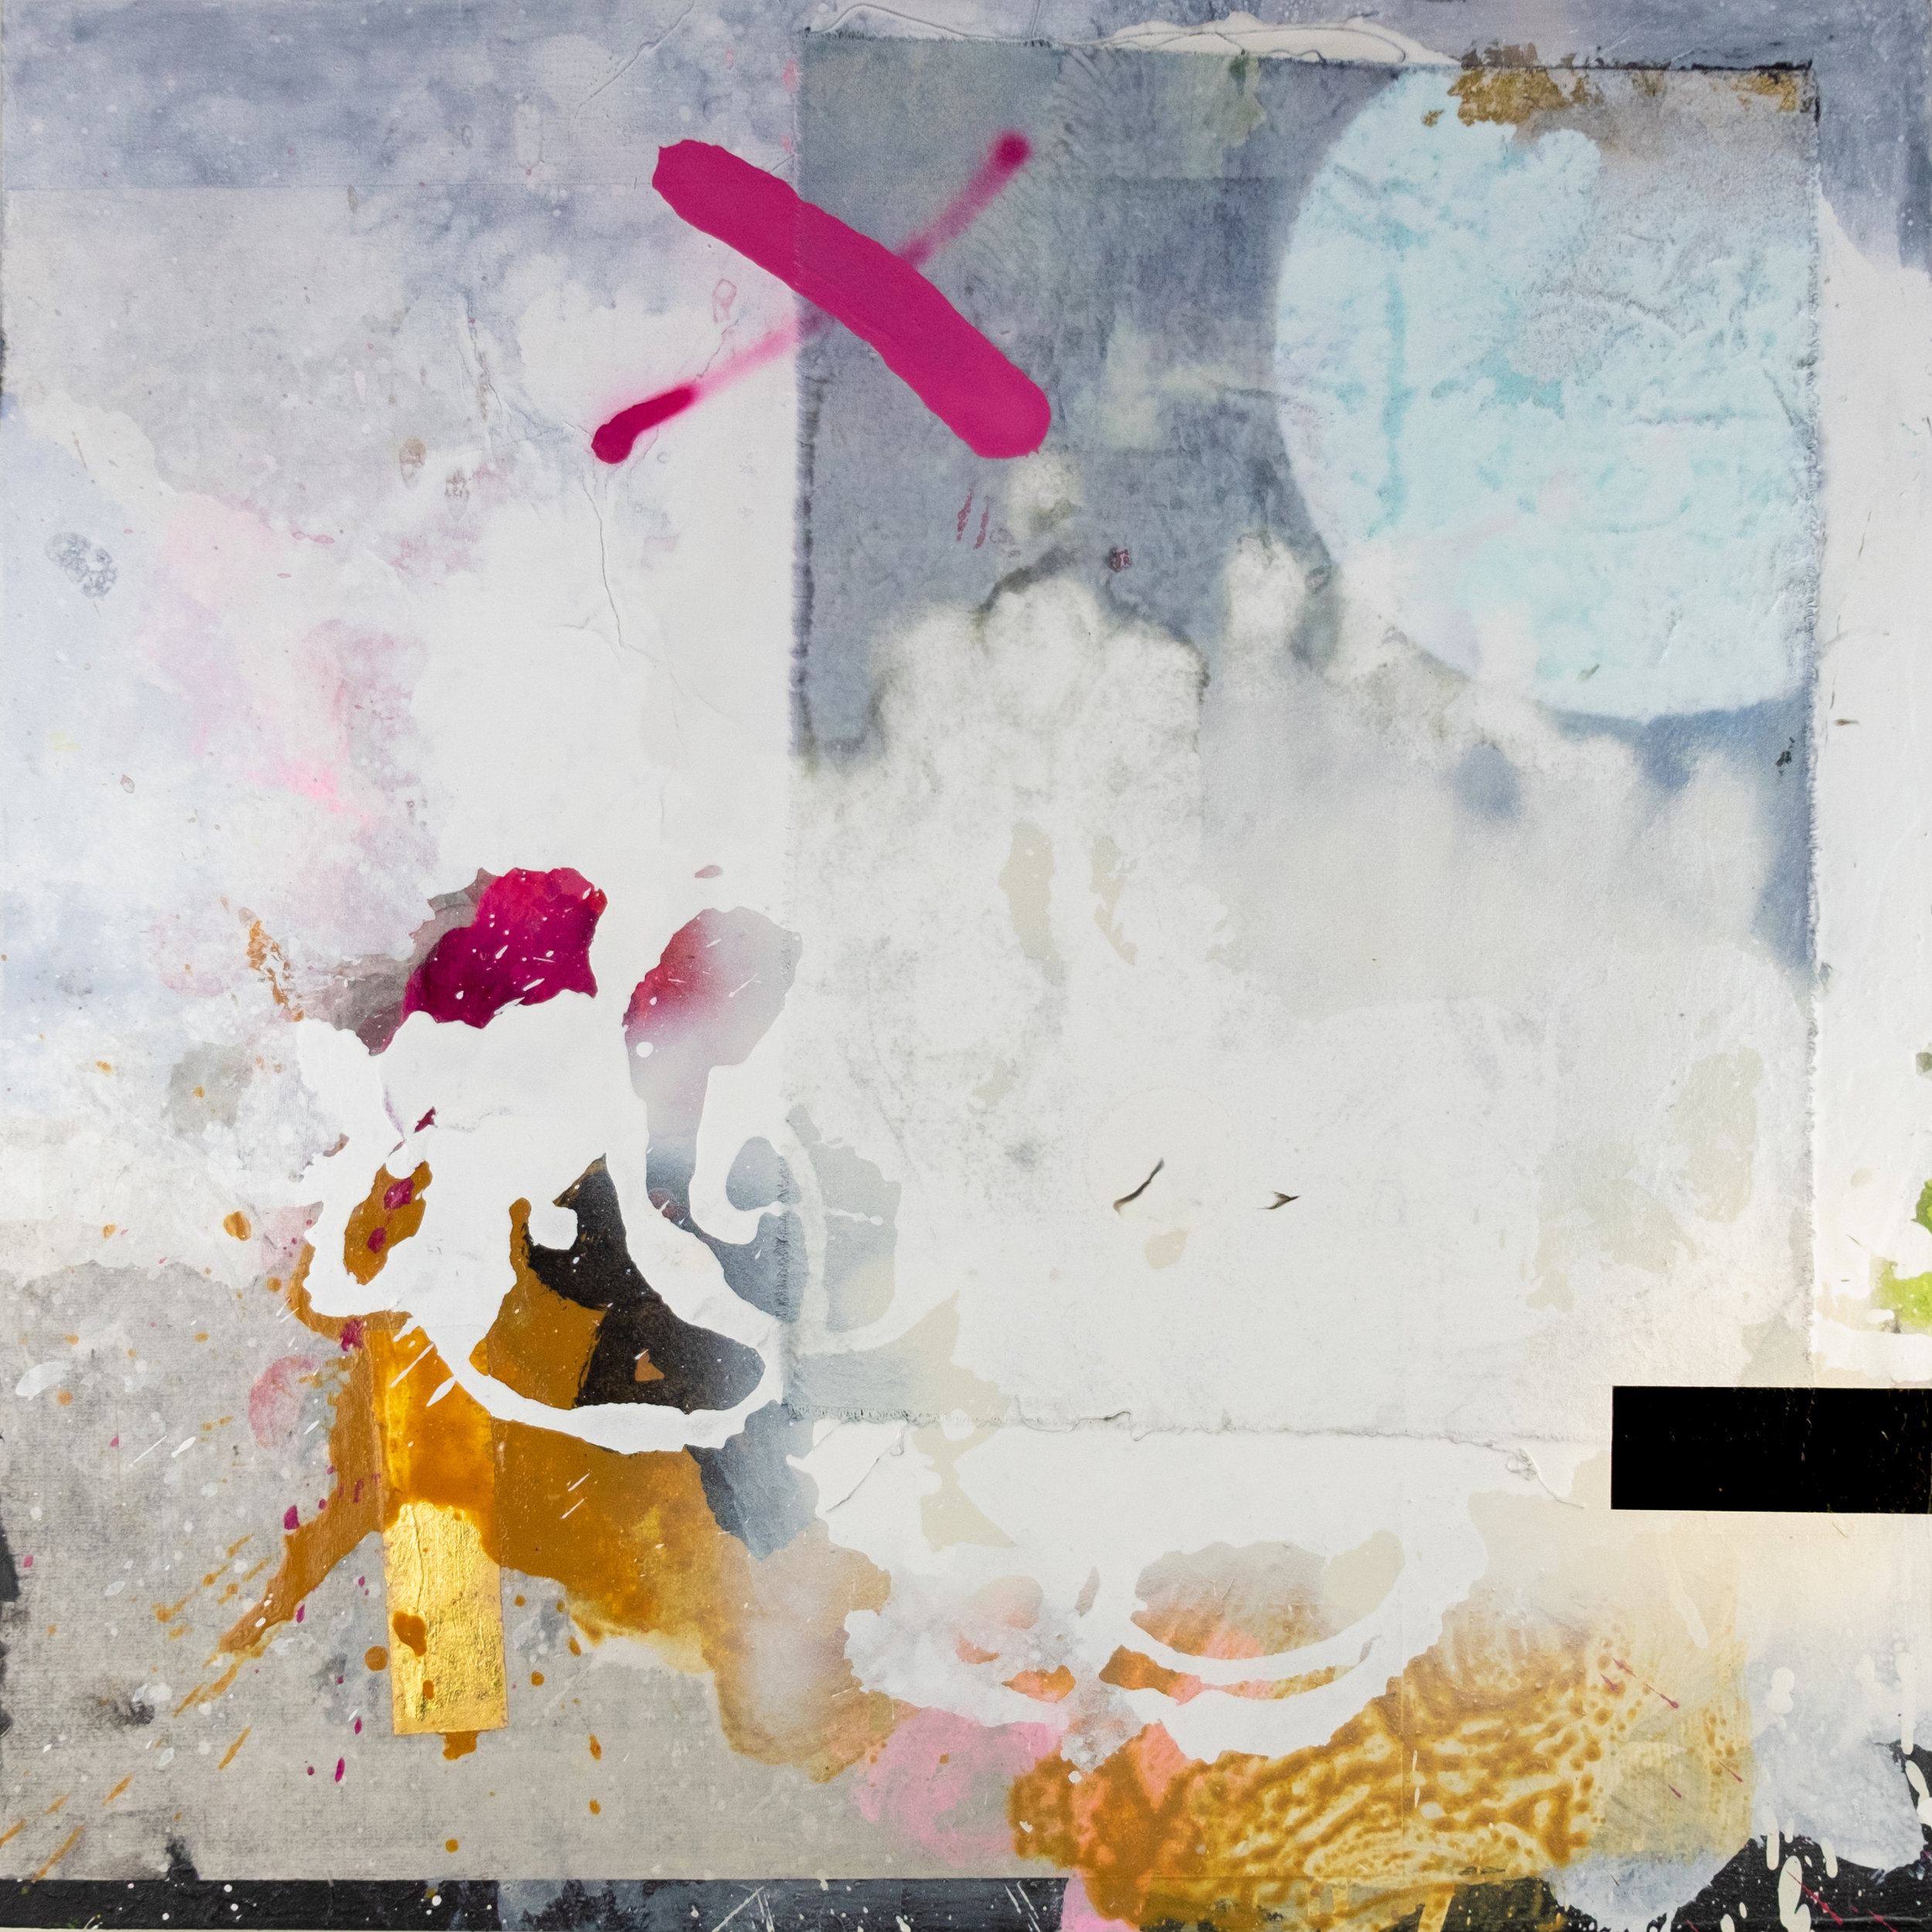 "Tantalus, no. 4   Acrylic, Collage, Aerosol and Gold Leaf on Panel  24"" x 24""  2019"